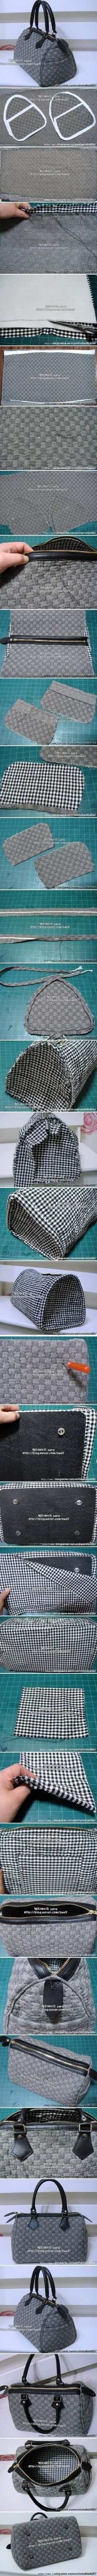 Sac à main de Nice à la mode Projets de bricolage bricolage | UsefulDIY.com par batjas88